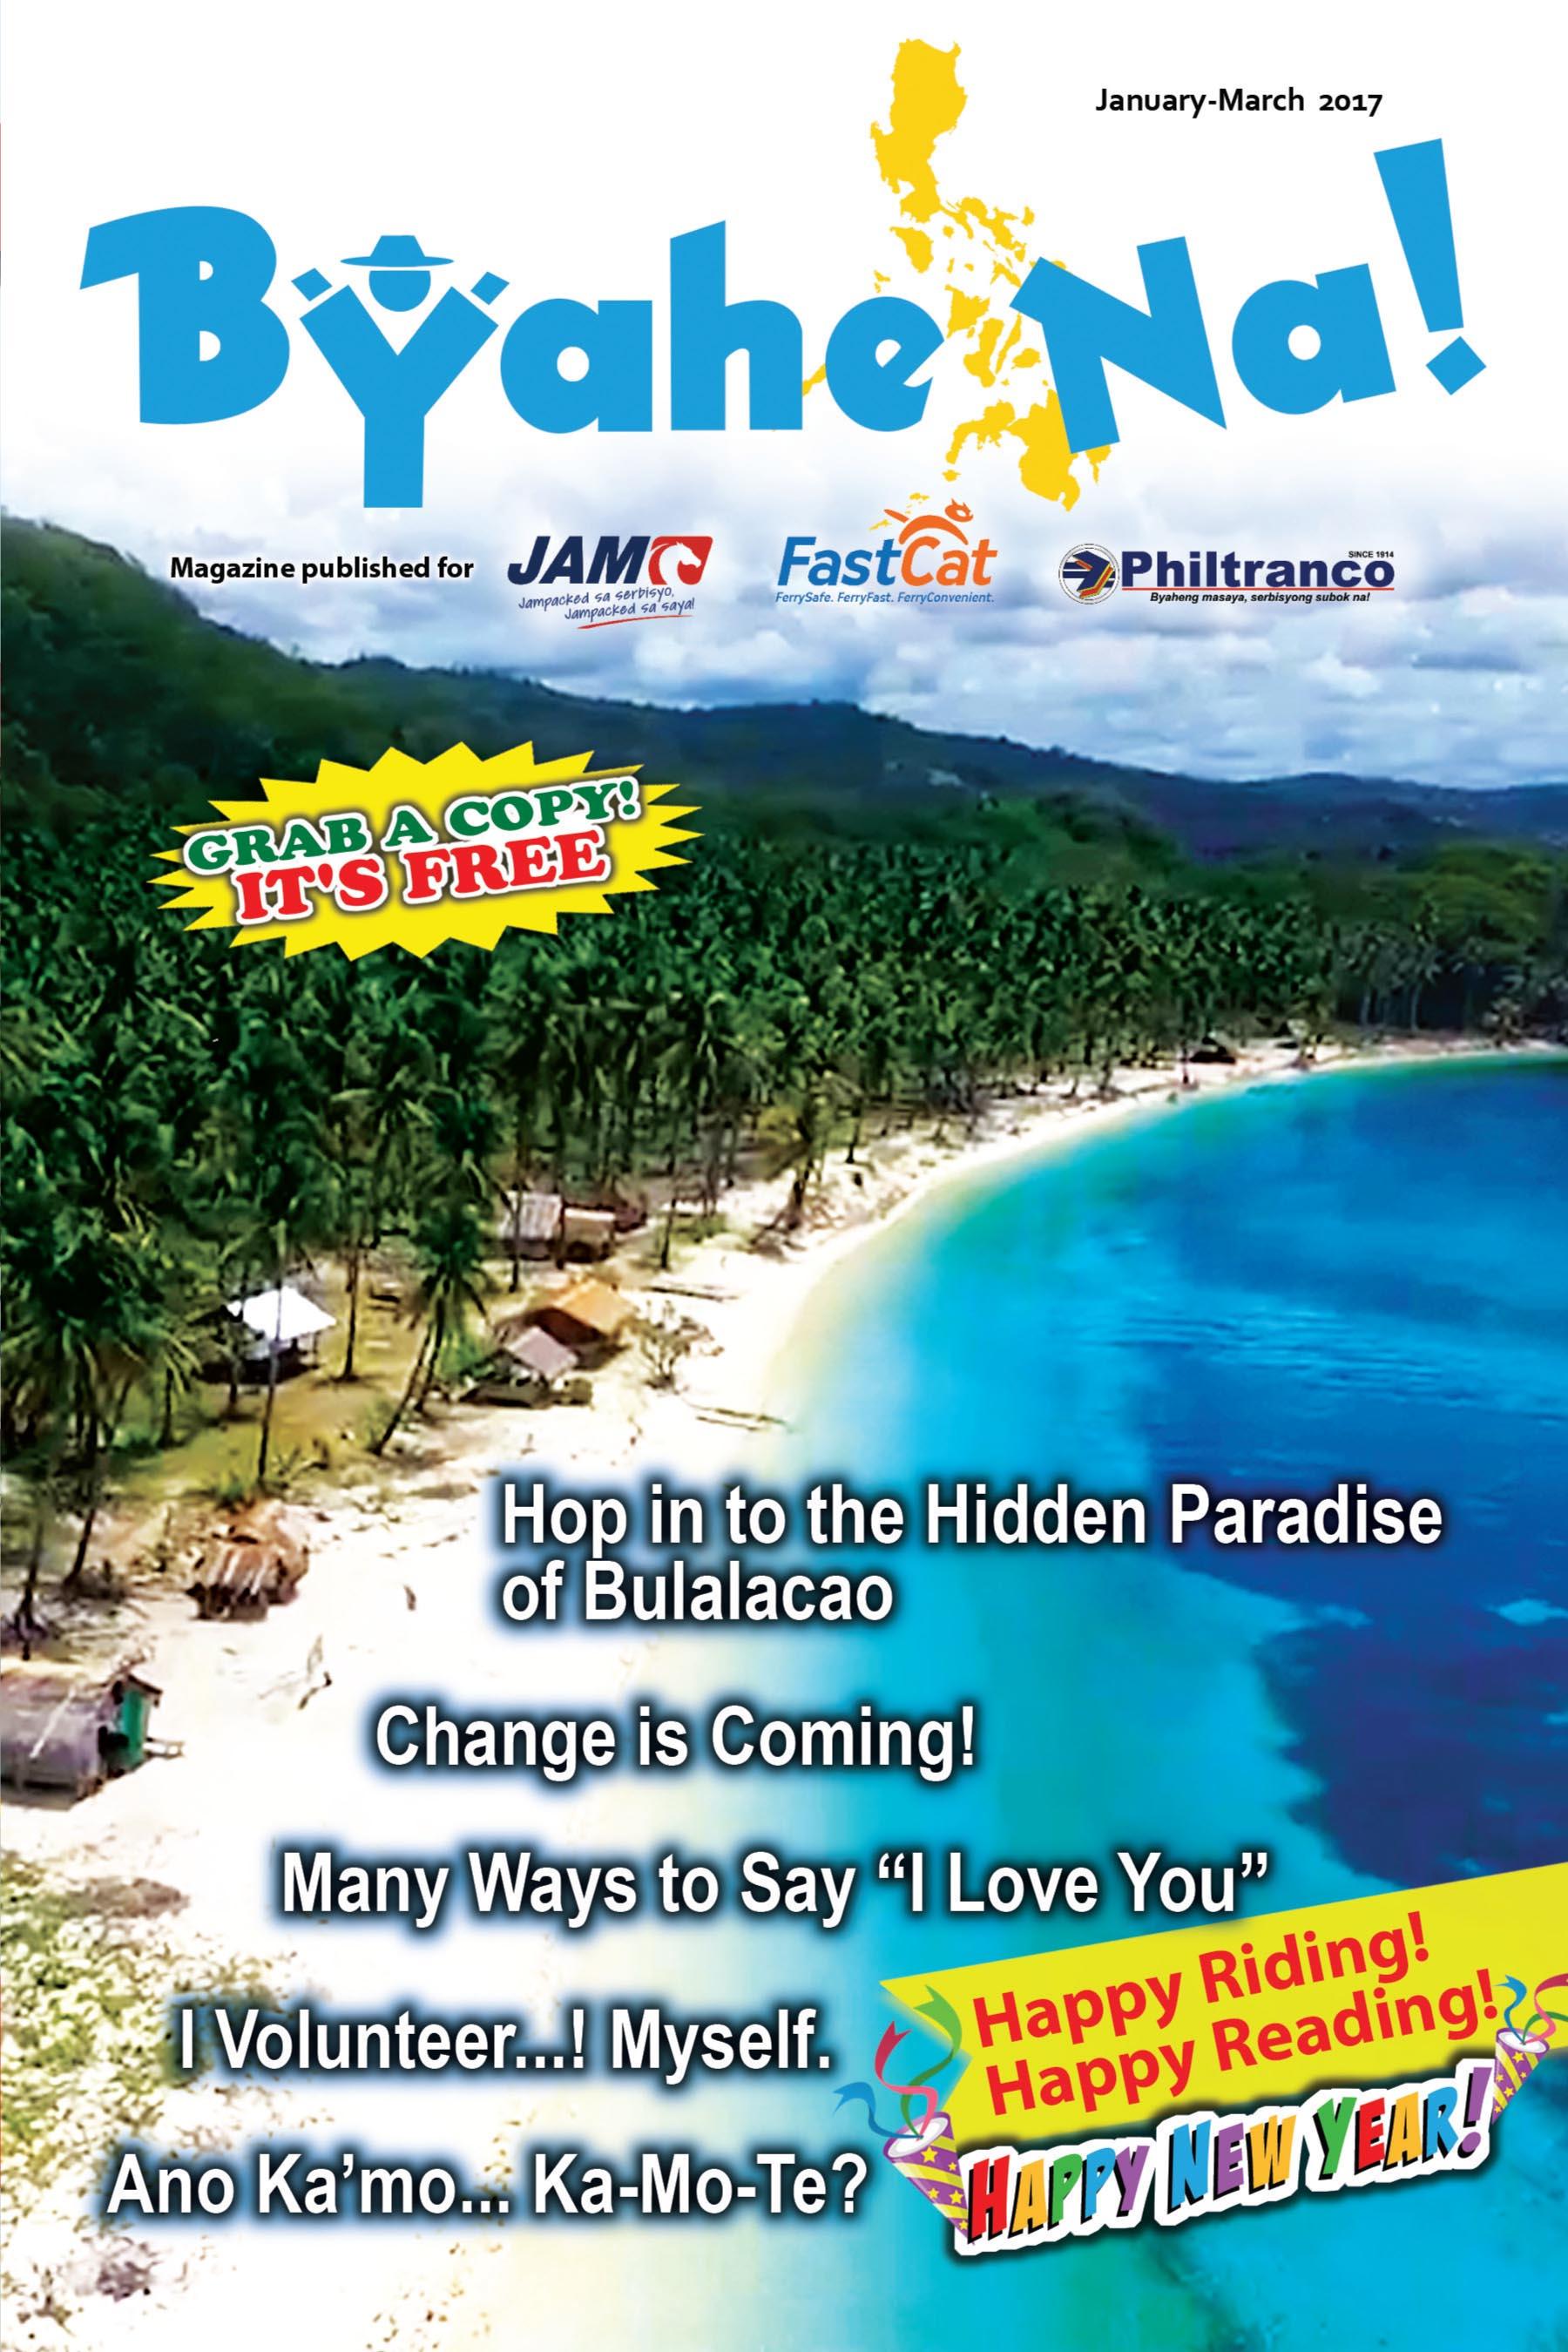 Byahe Na! 11th issue